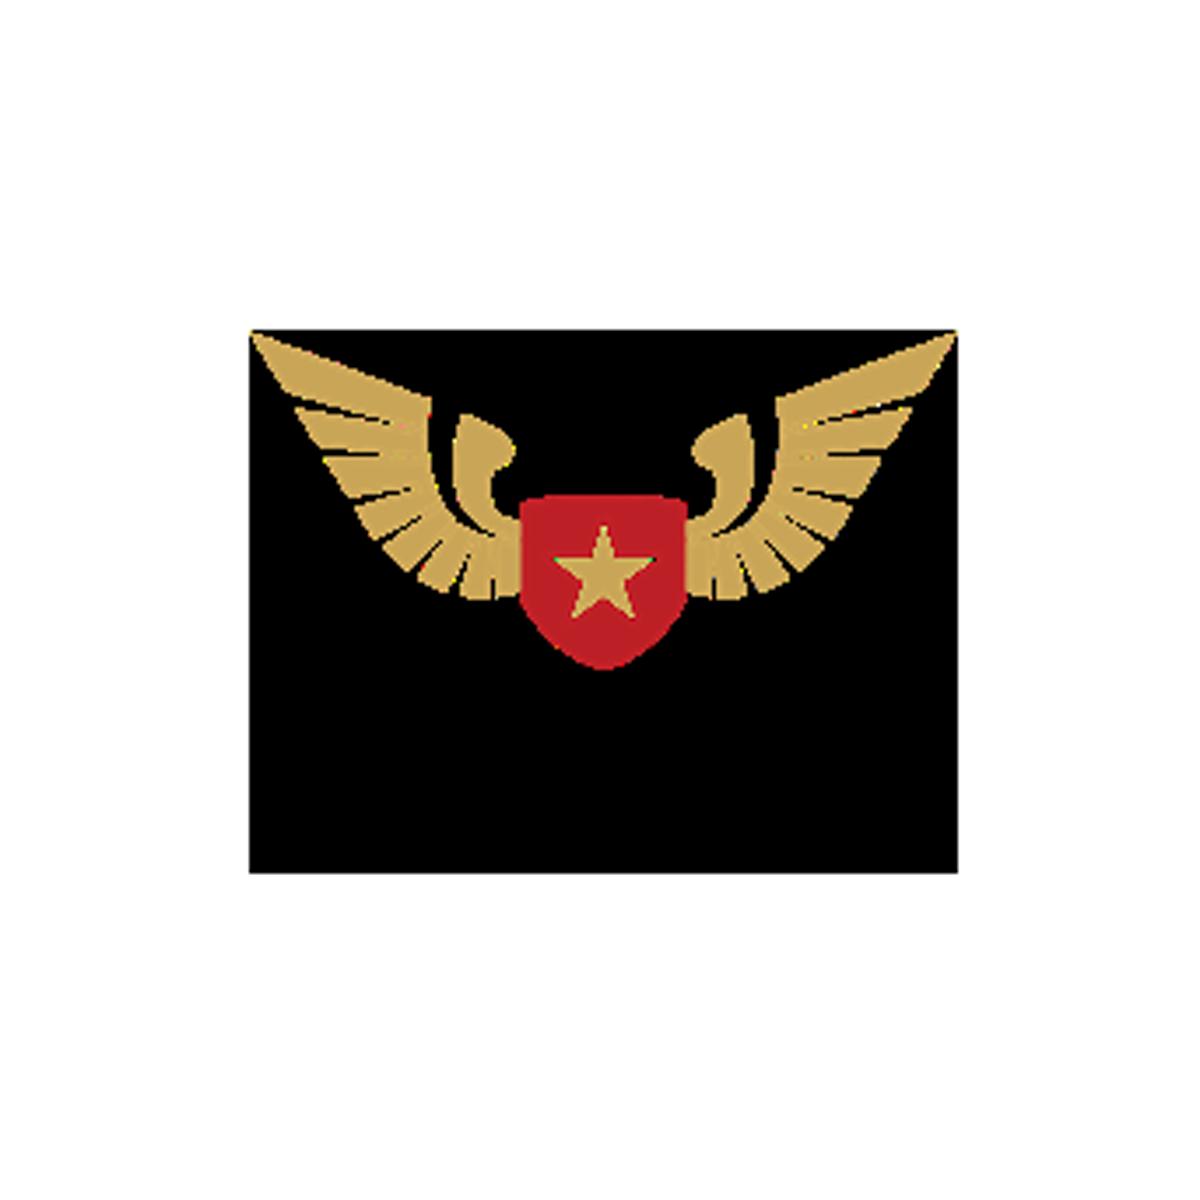 The Wingman Foundation